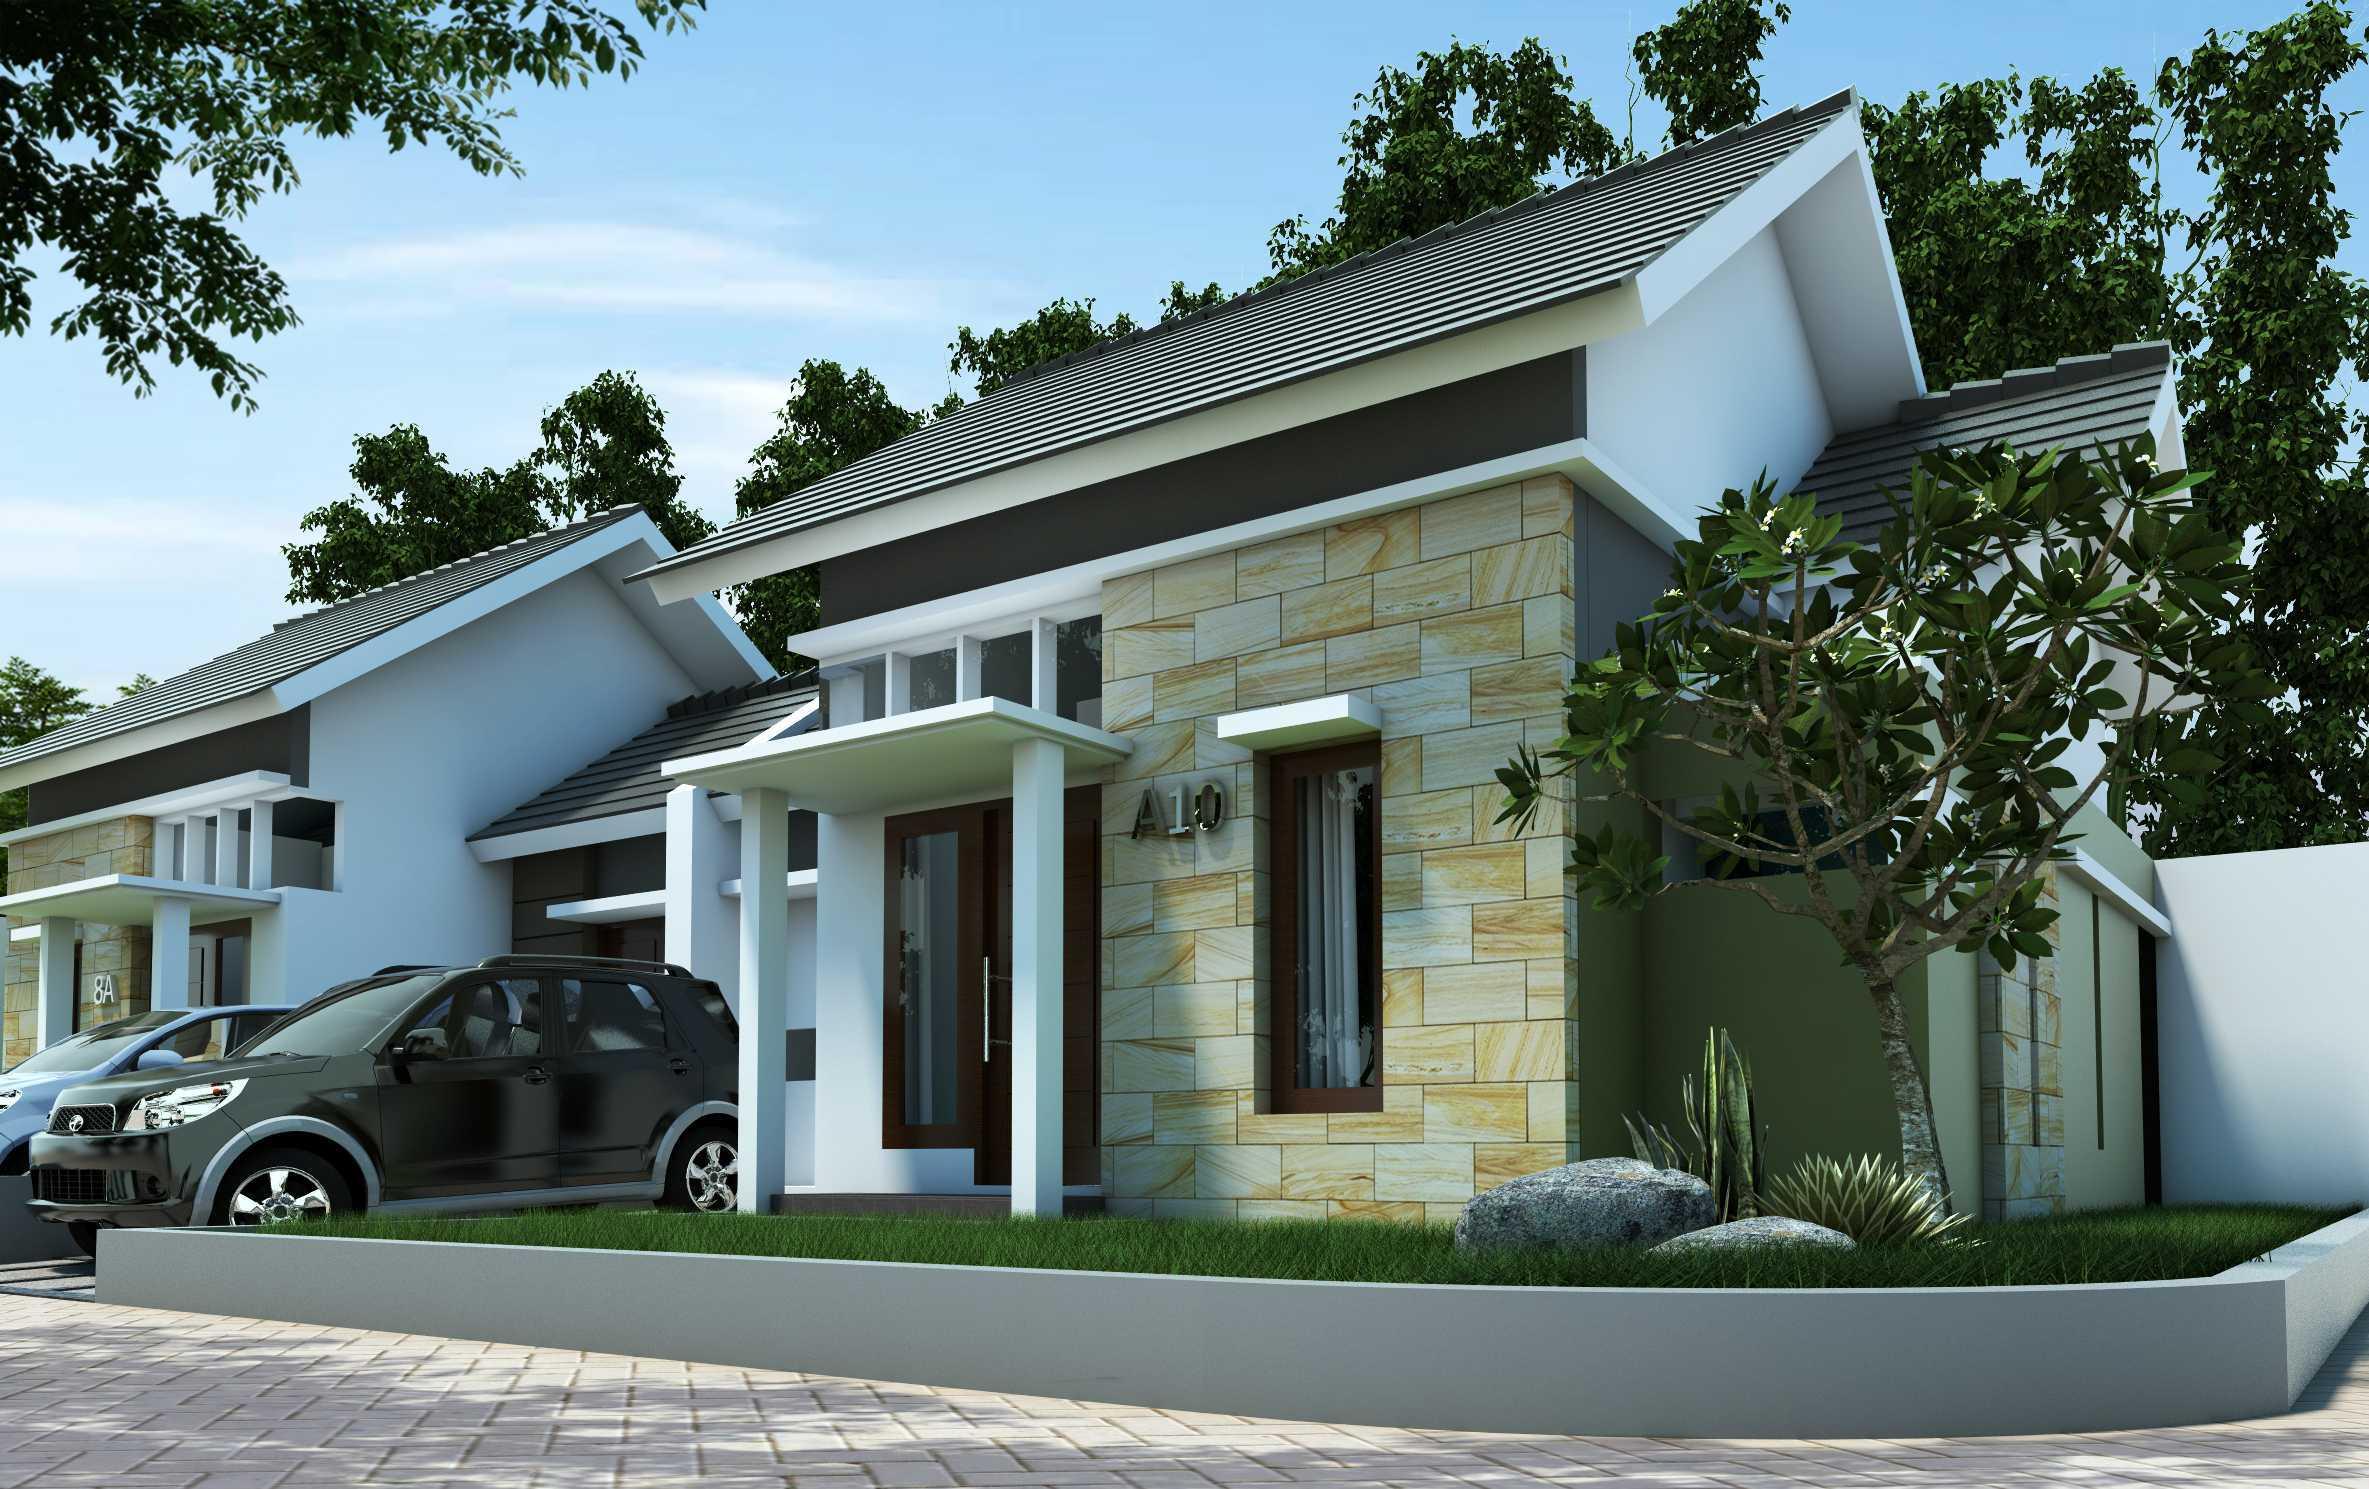 Arsatama Architect Grand Nglajo Regency - Cepu Cepu, Central Java Cepu, Central Java Tipe-Ahook Kontemporer  19100